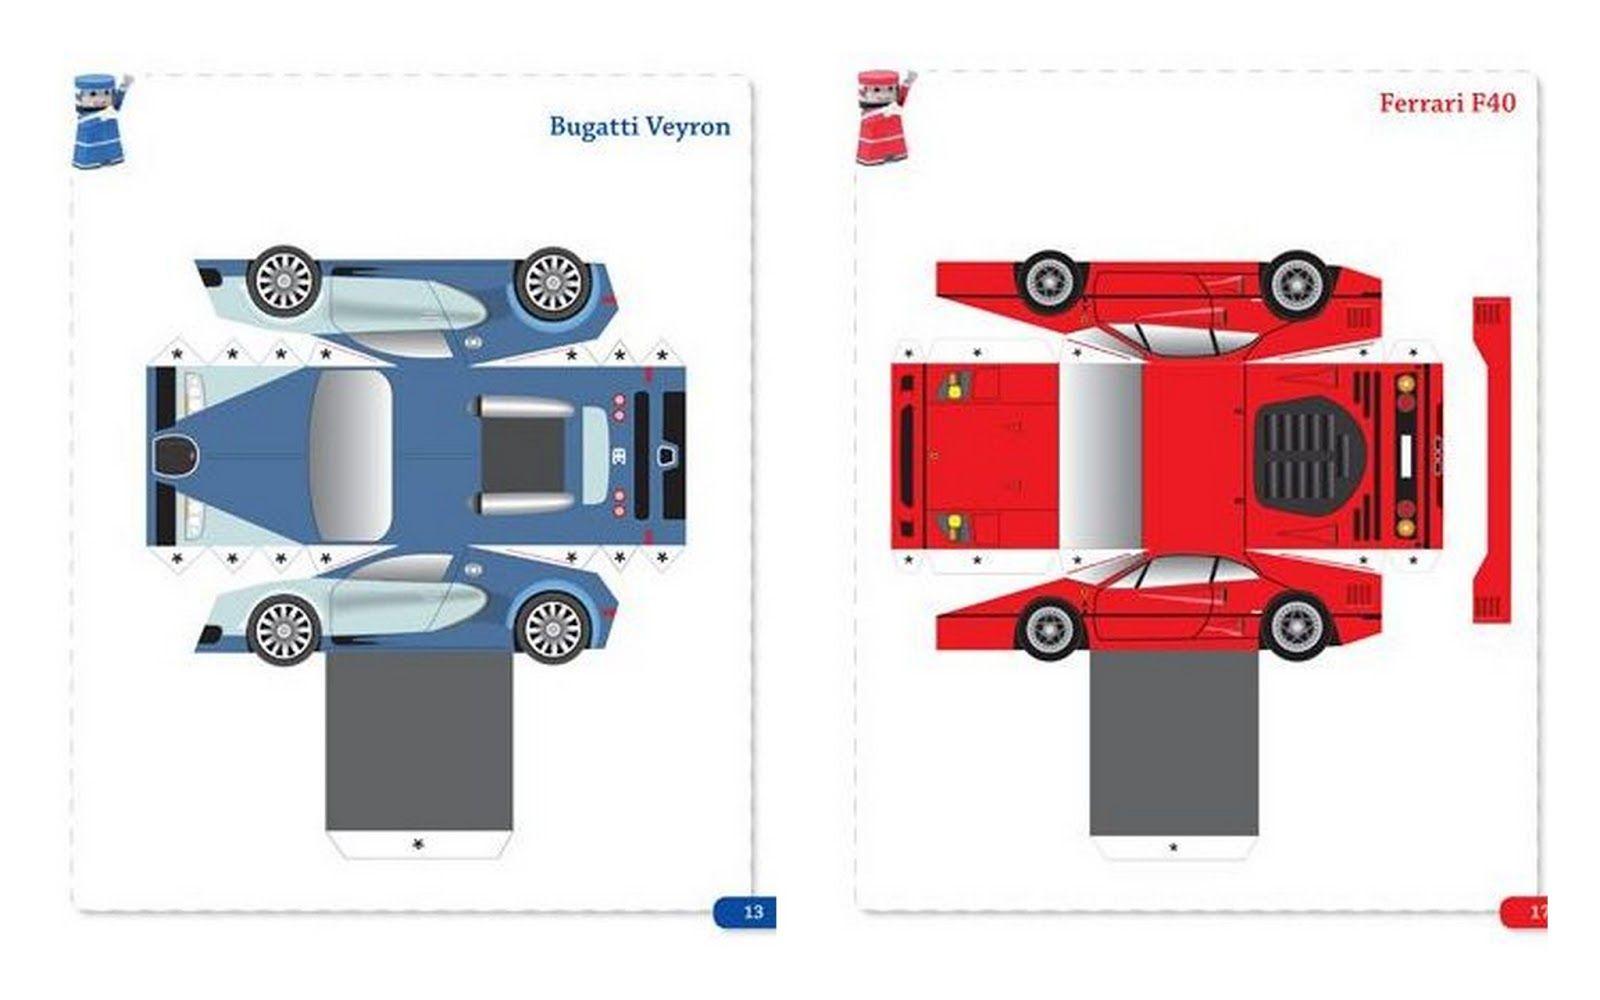 Bugatti Veyron - Ferrari F40 | AUTOS PARA IMPRIMIR | Pinterest ...